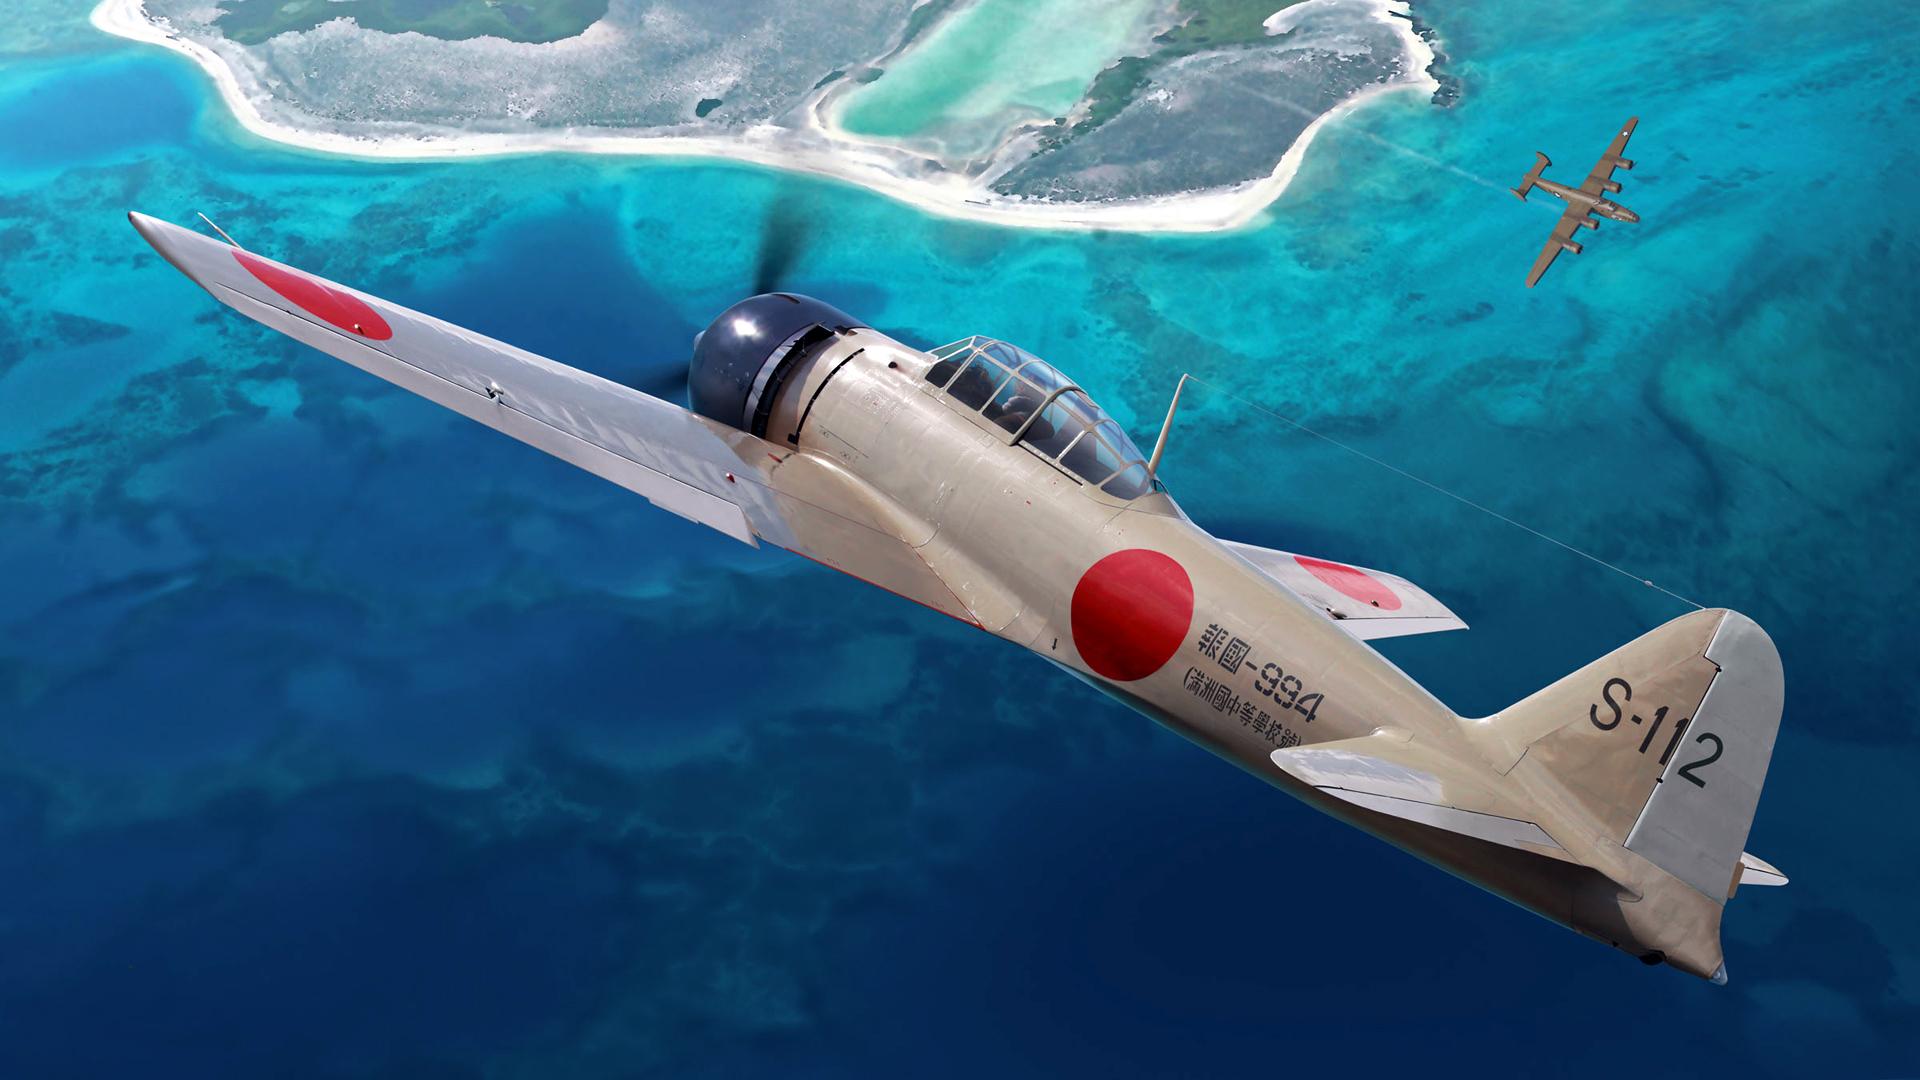 99 mitsubishi a6m zero japan wwii pacificocean - HD1920×1080